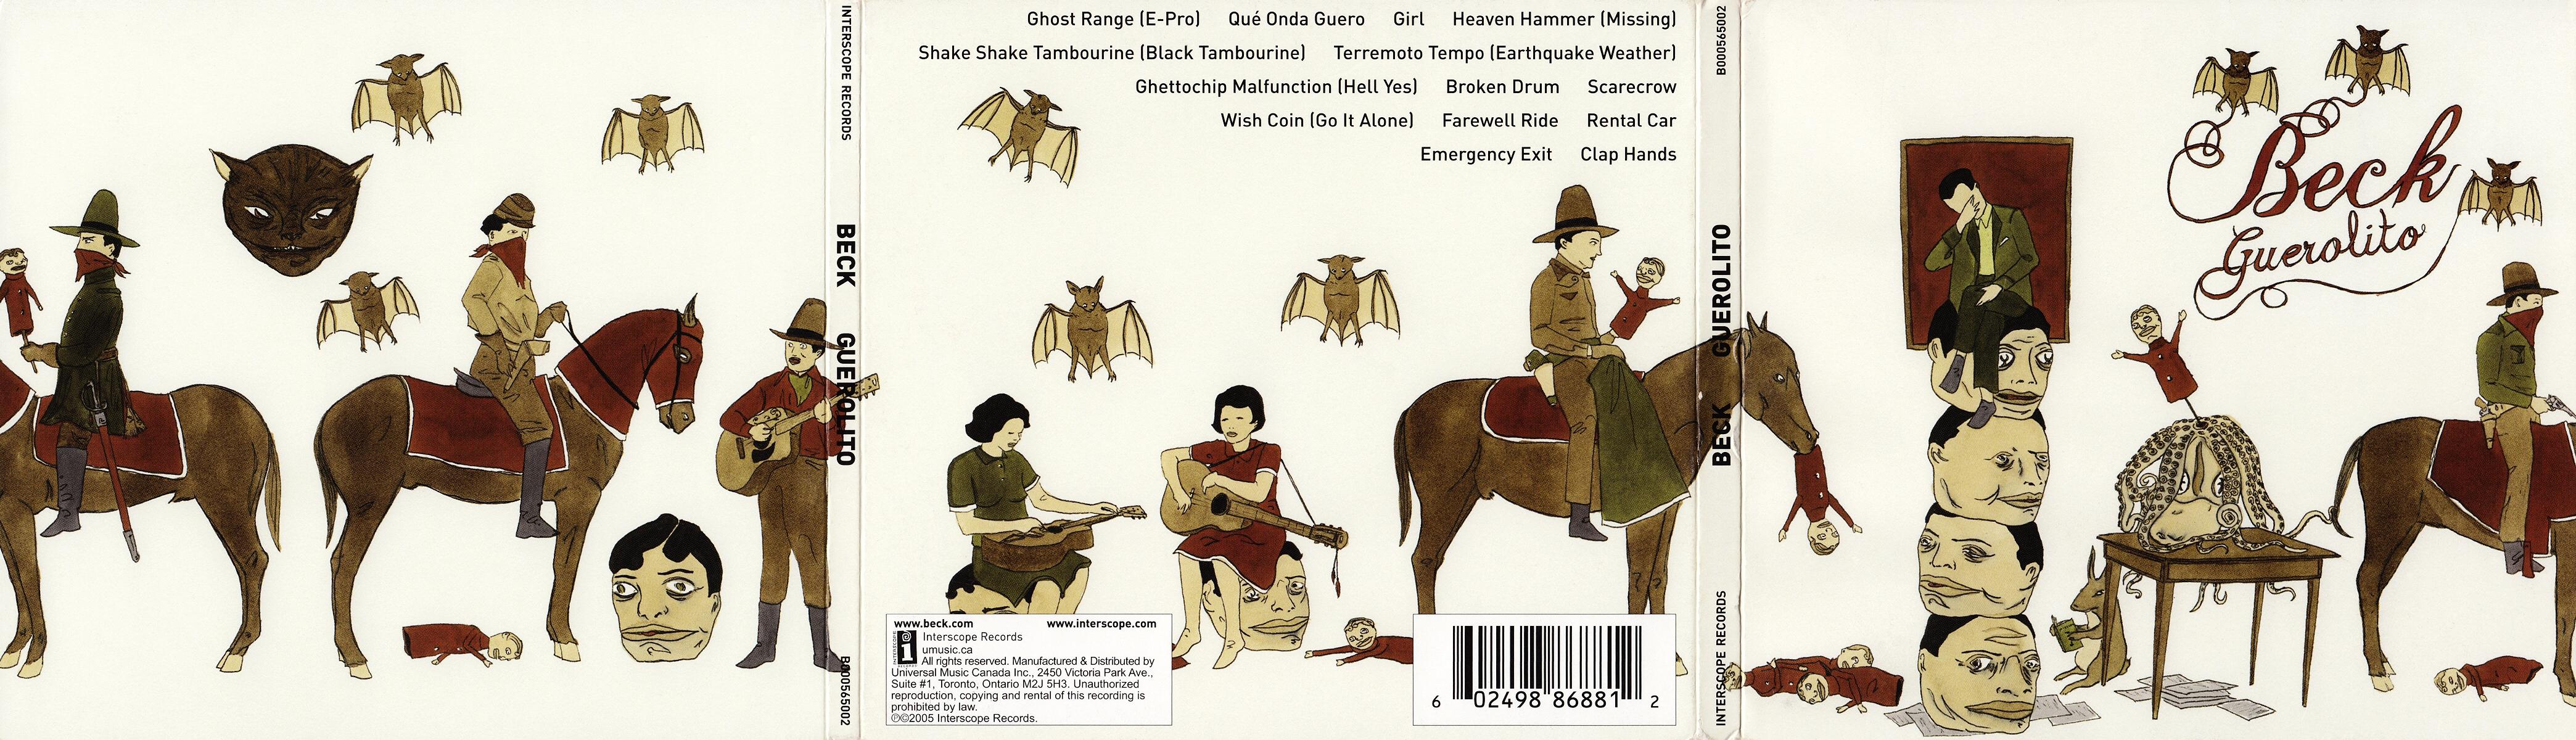 Scarica la copertina cd Beck - Guerolito - Digipack ...